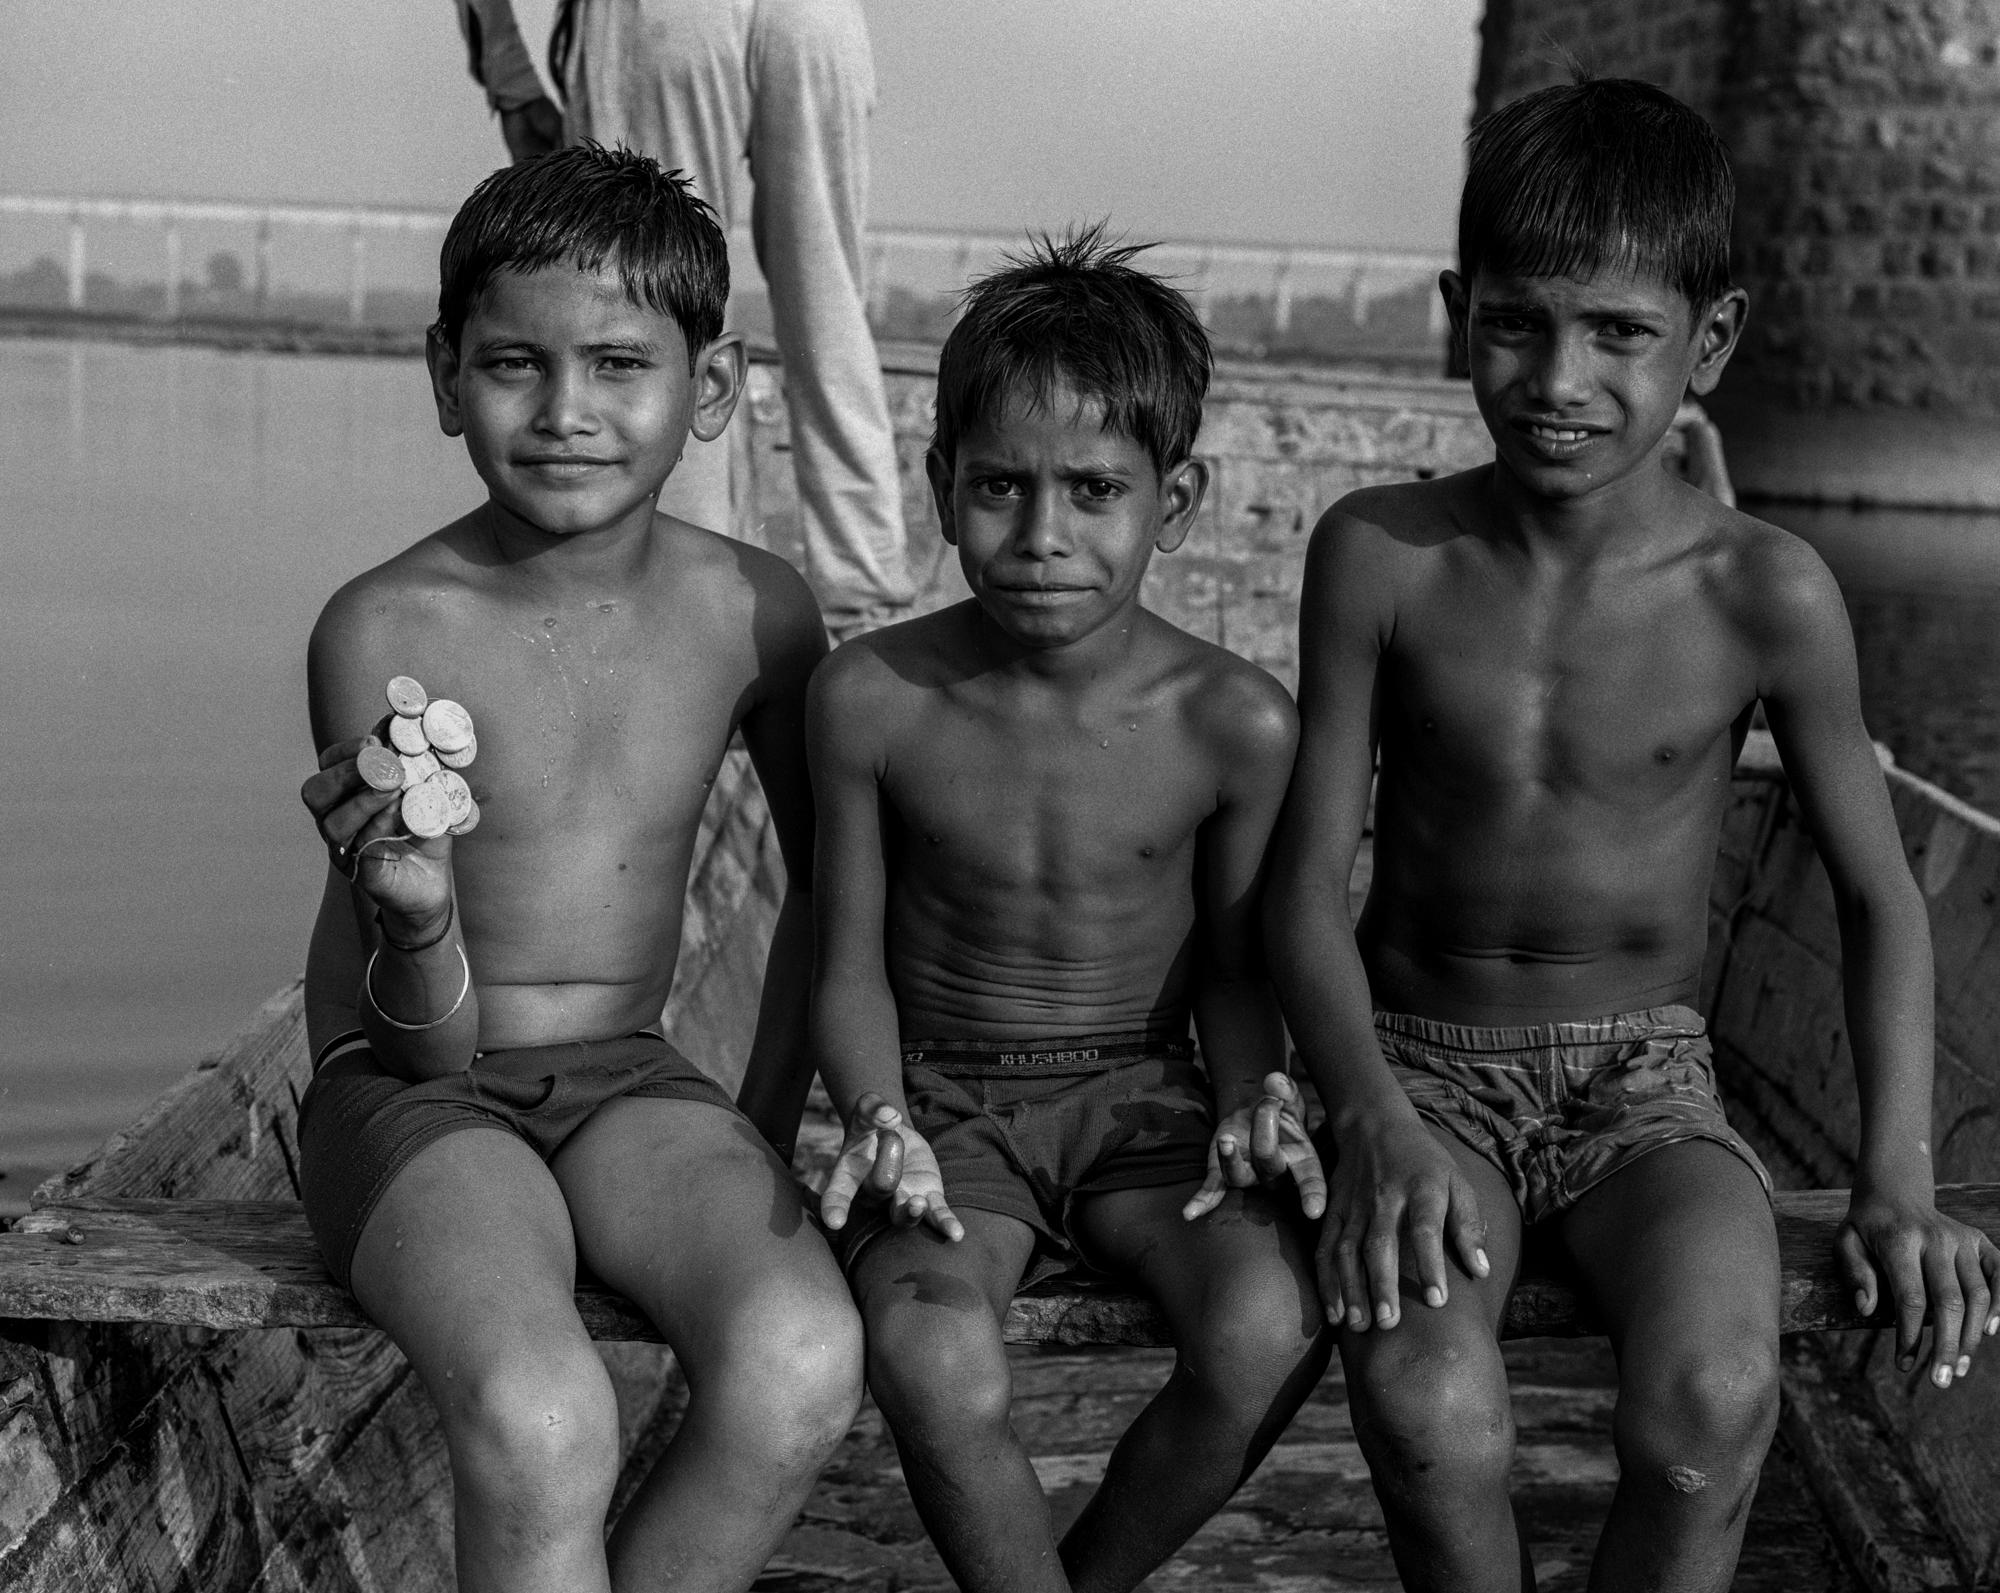 Group of young coin gatherers (Pic: Nandakumar Narasimhan)